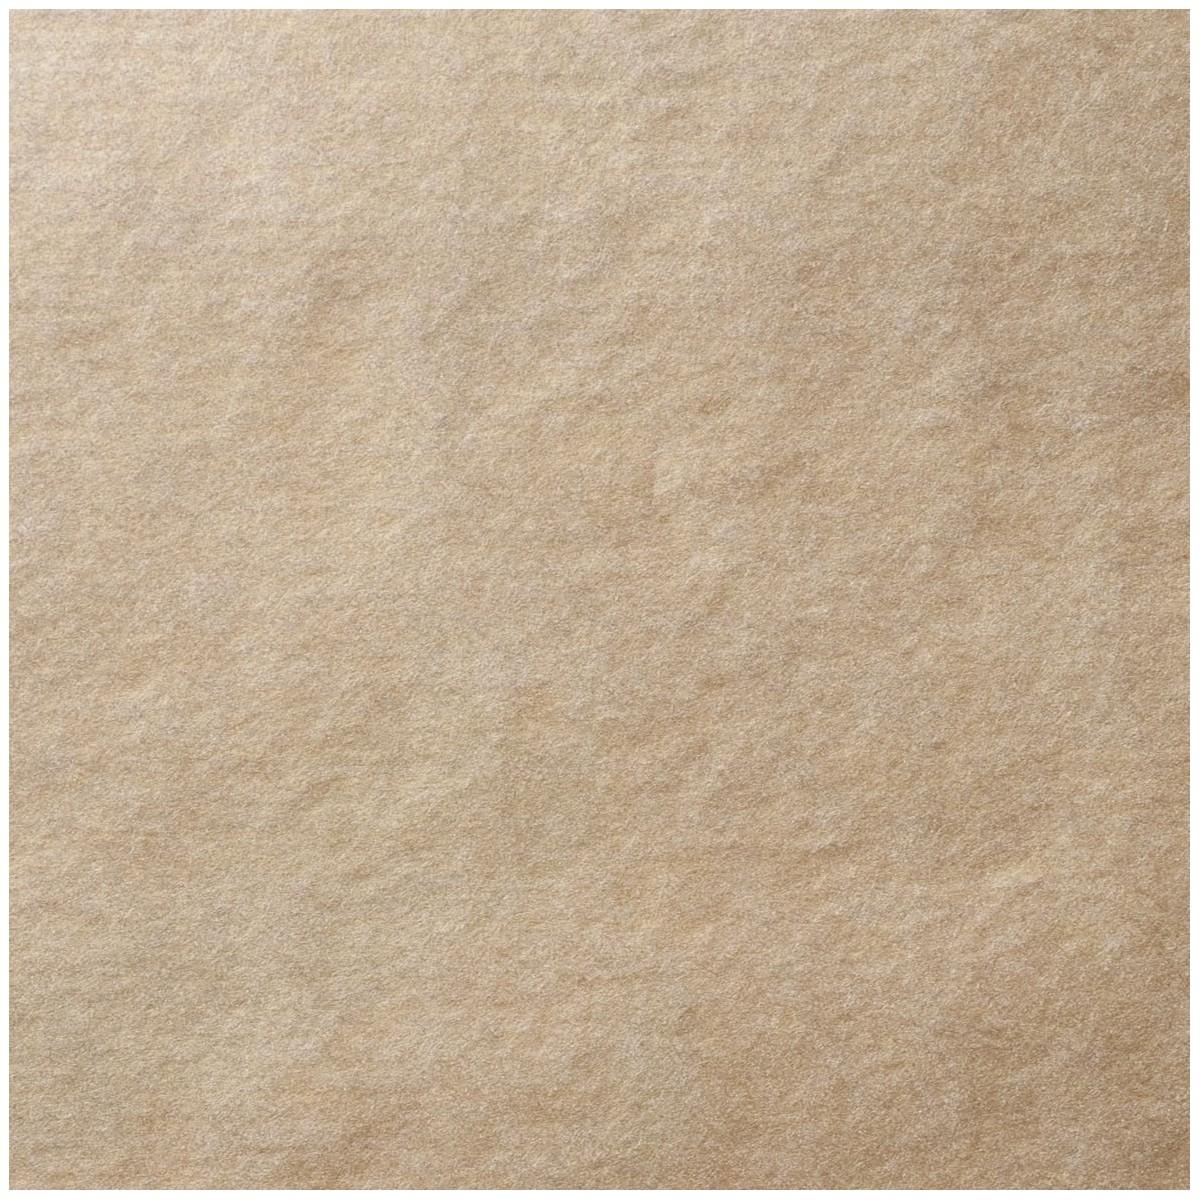 Carta Sealing Avana ECOBROWN Gr.60 Fogli Cm.70x100 Colori Tinta Unita (al Kg.)